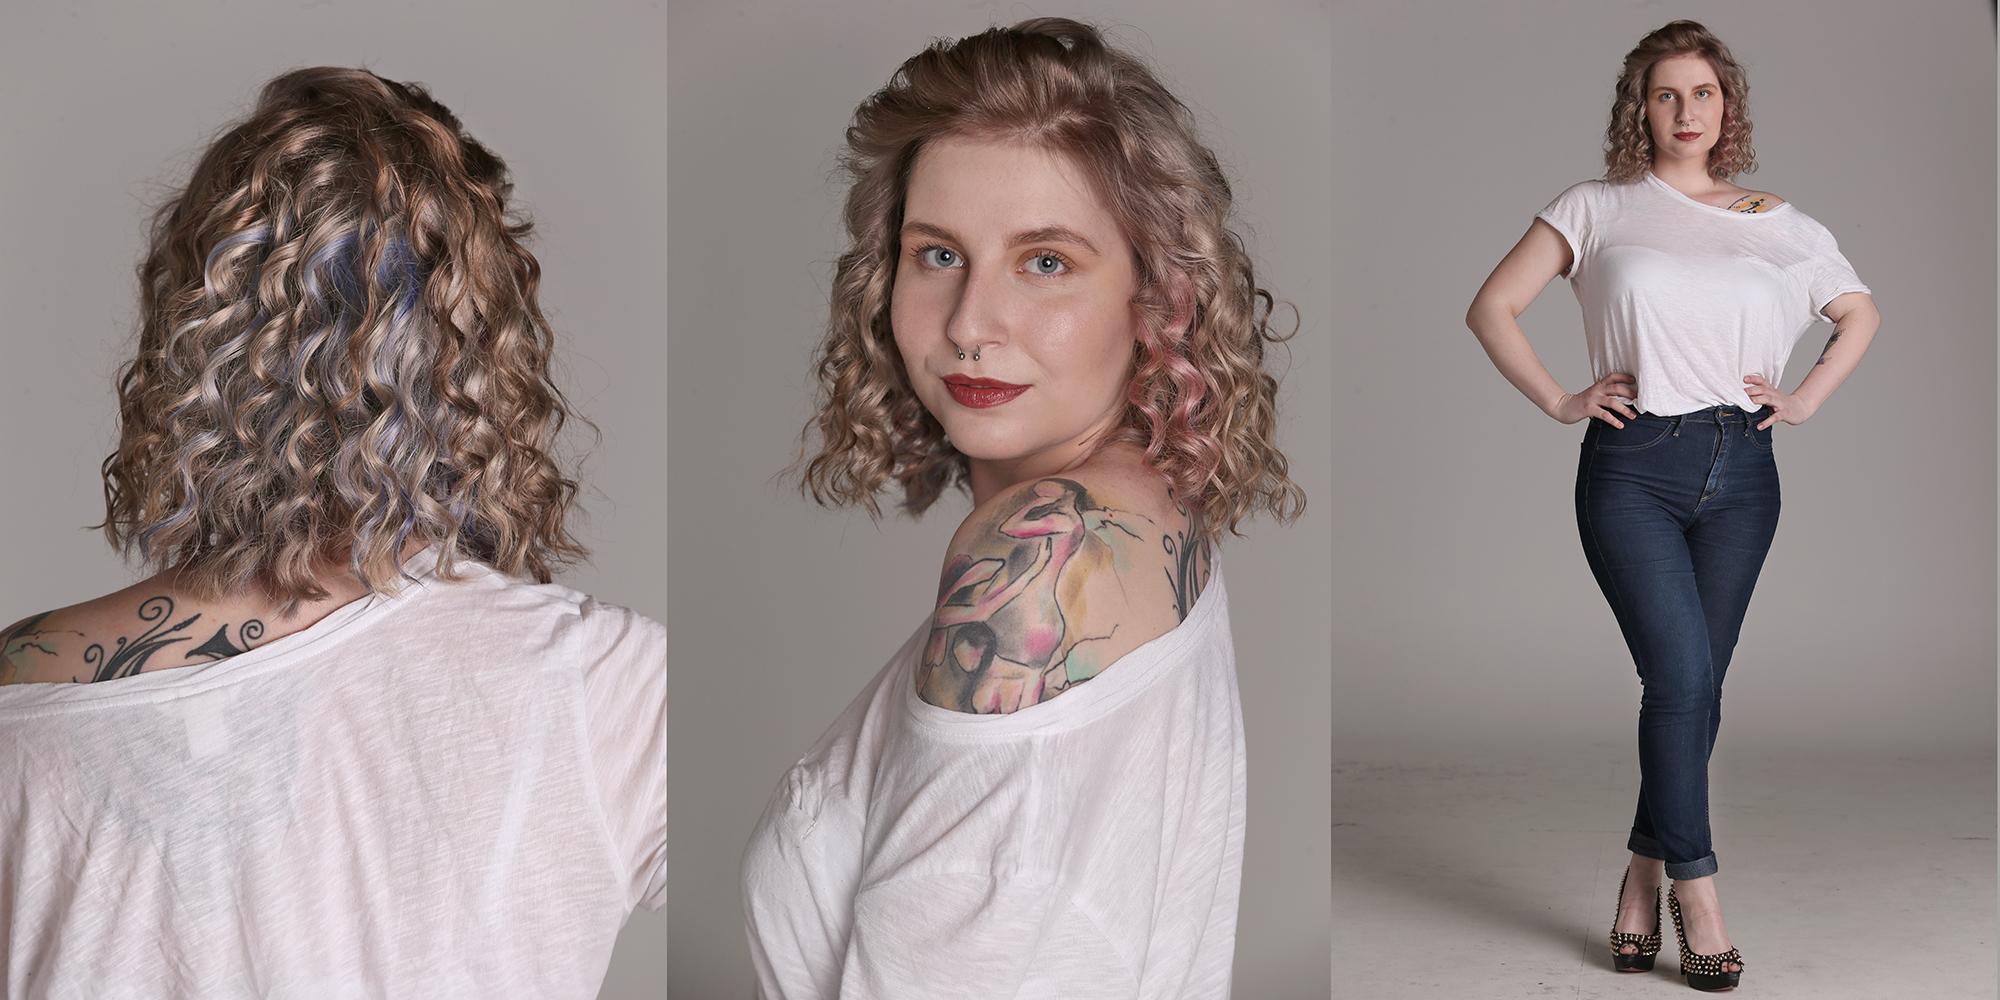 HAIR: ANGIE, MODEL: MAŤKA, PHOTO: LSZ PHOTOGRAPHY